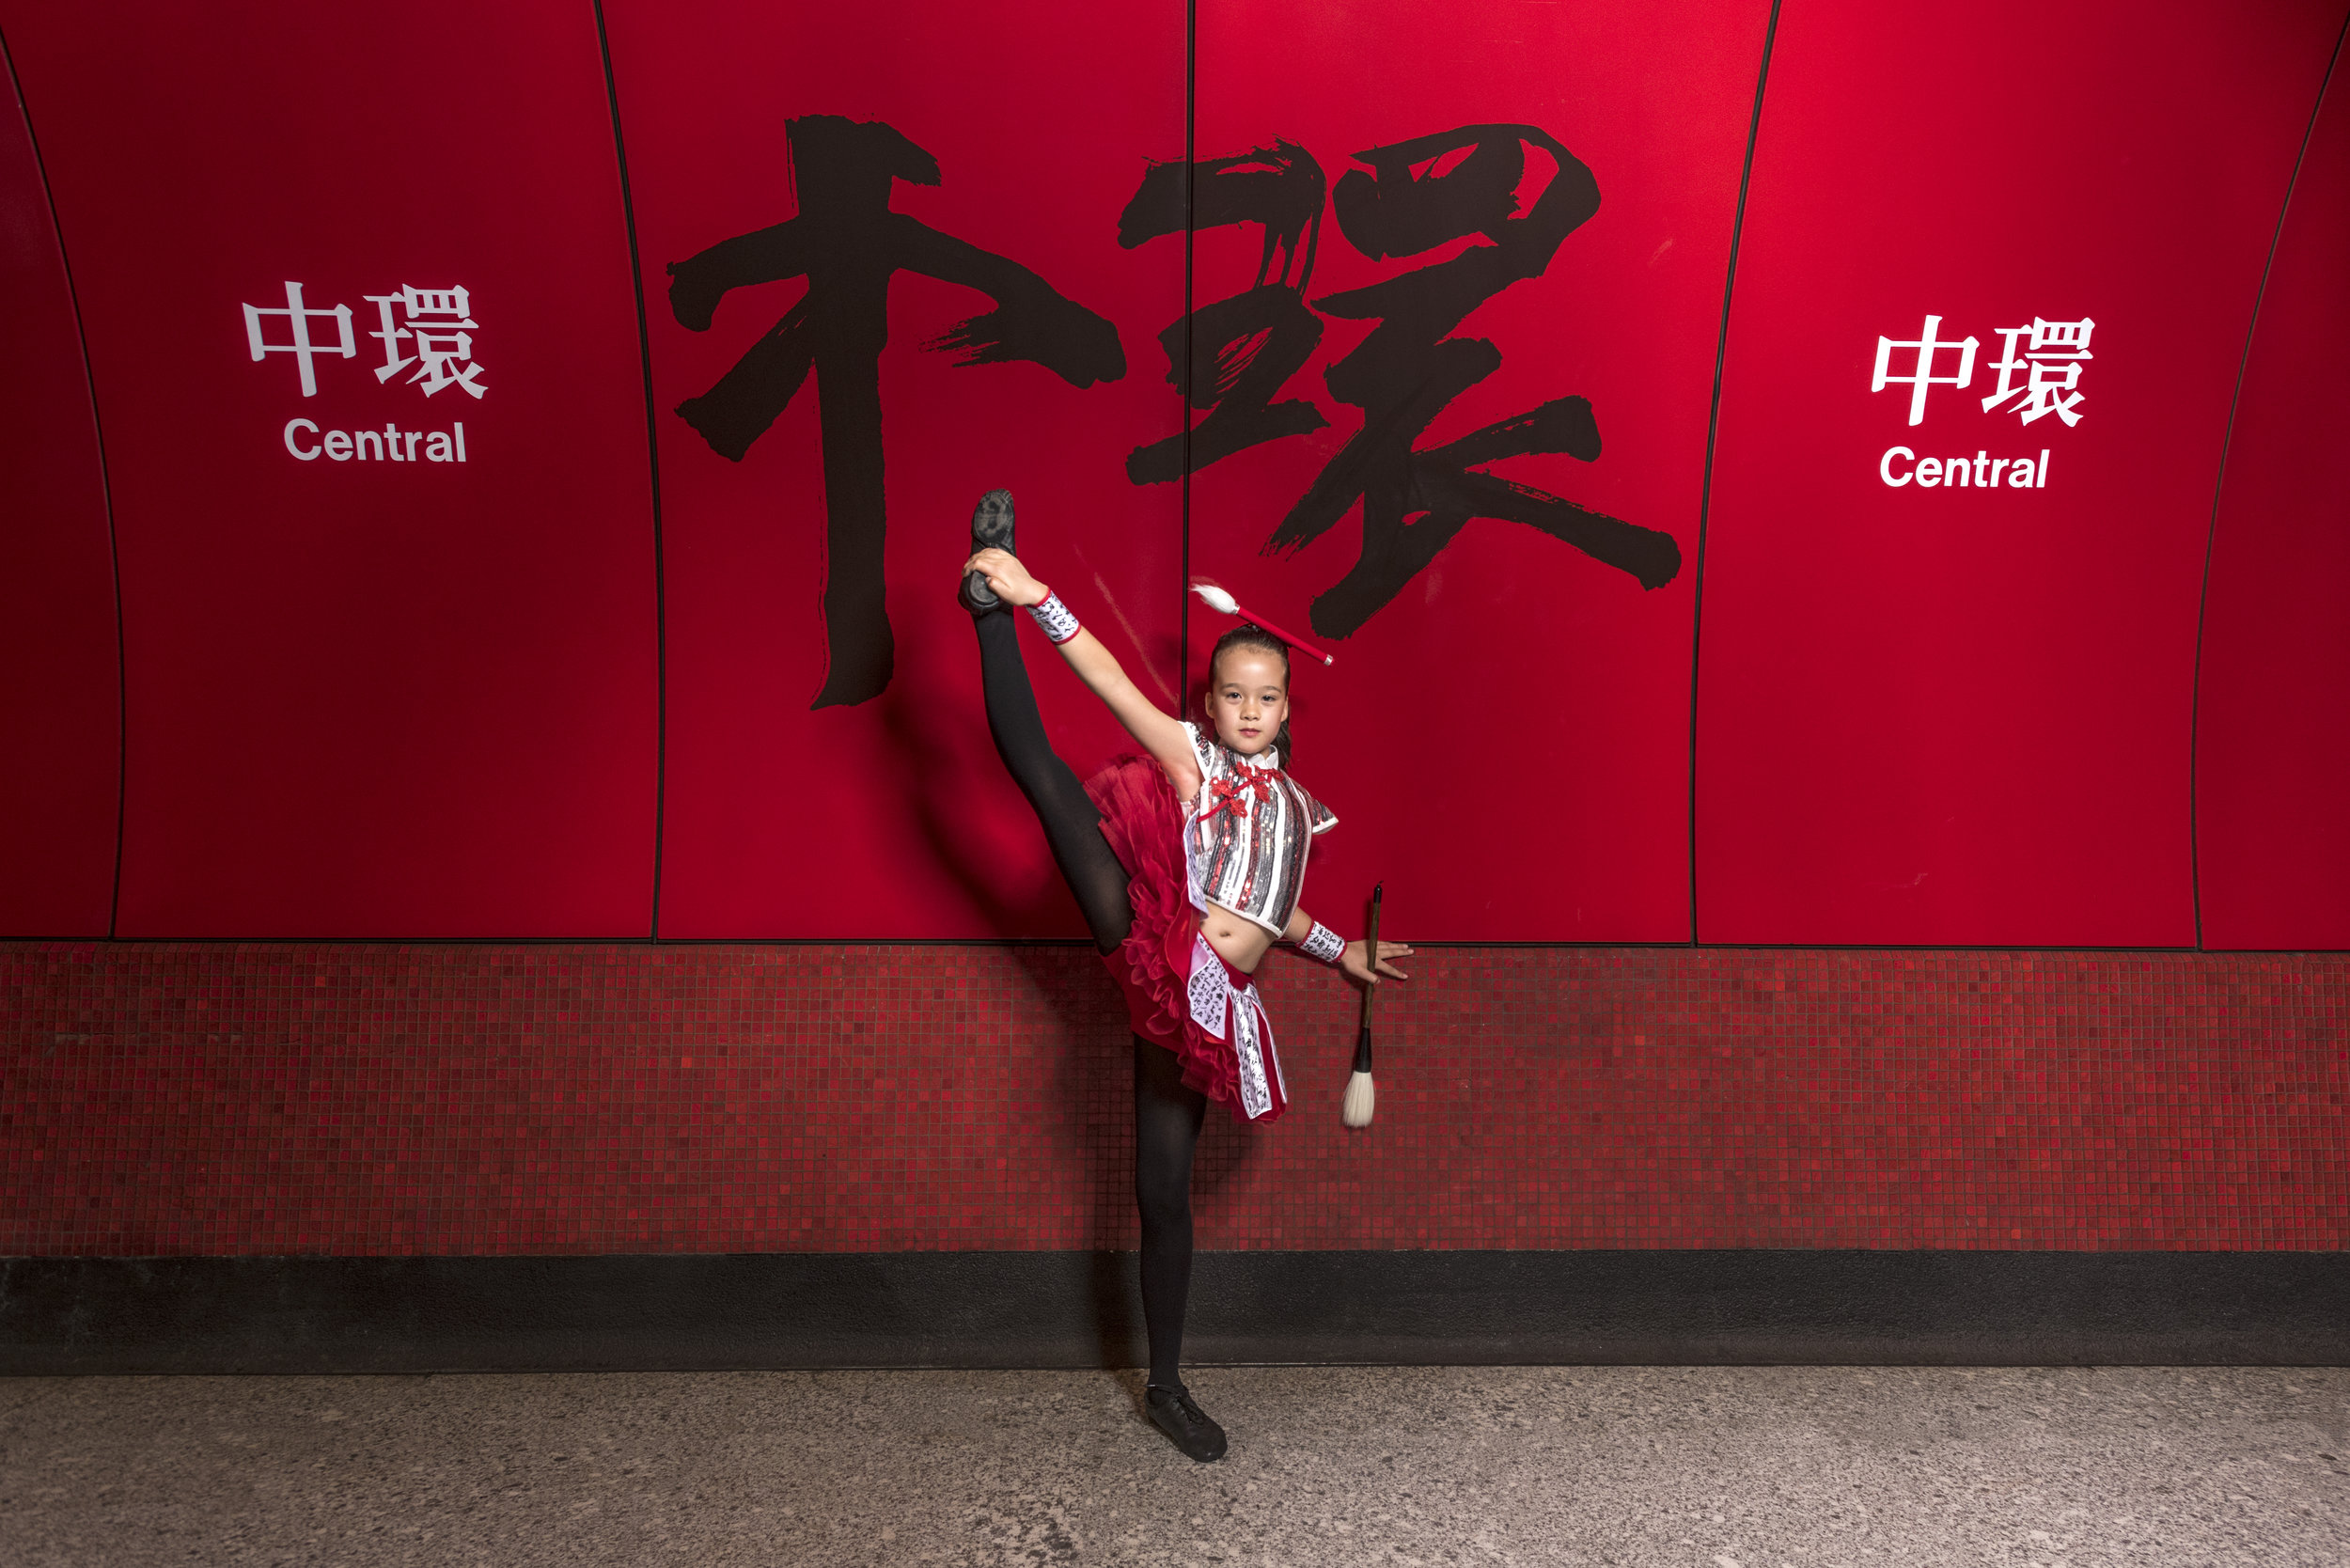 Central MTR.jpg